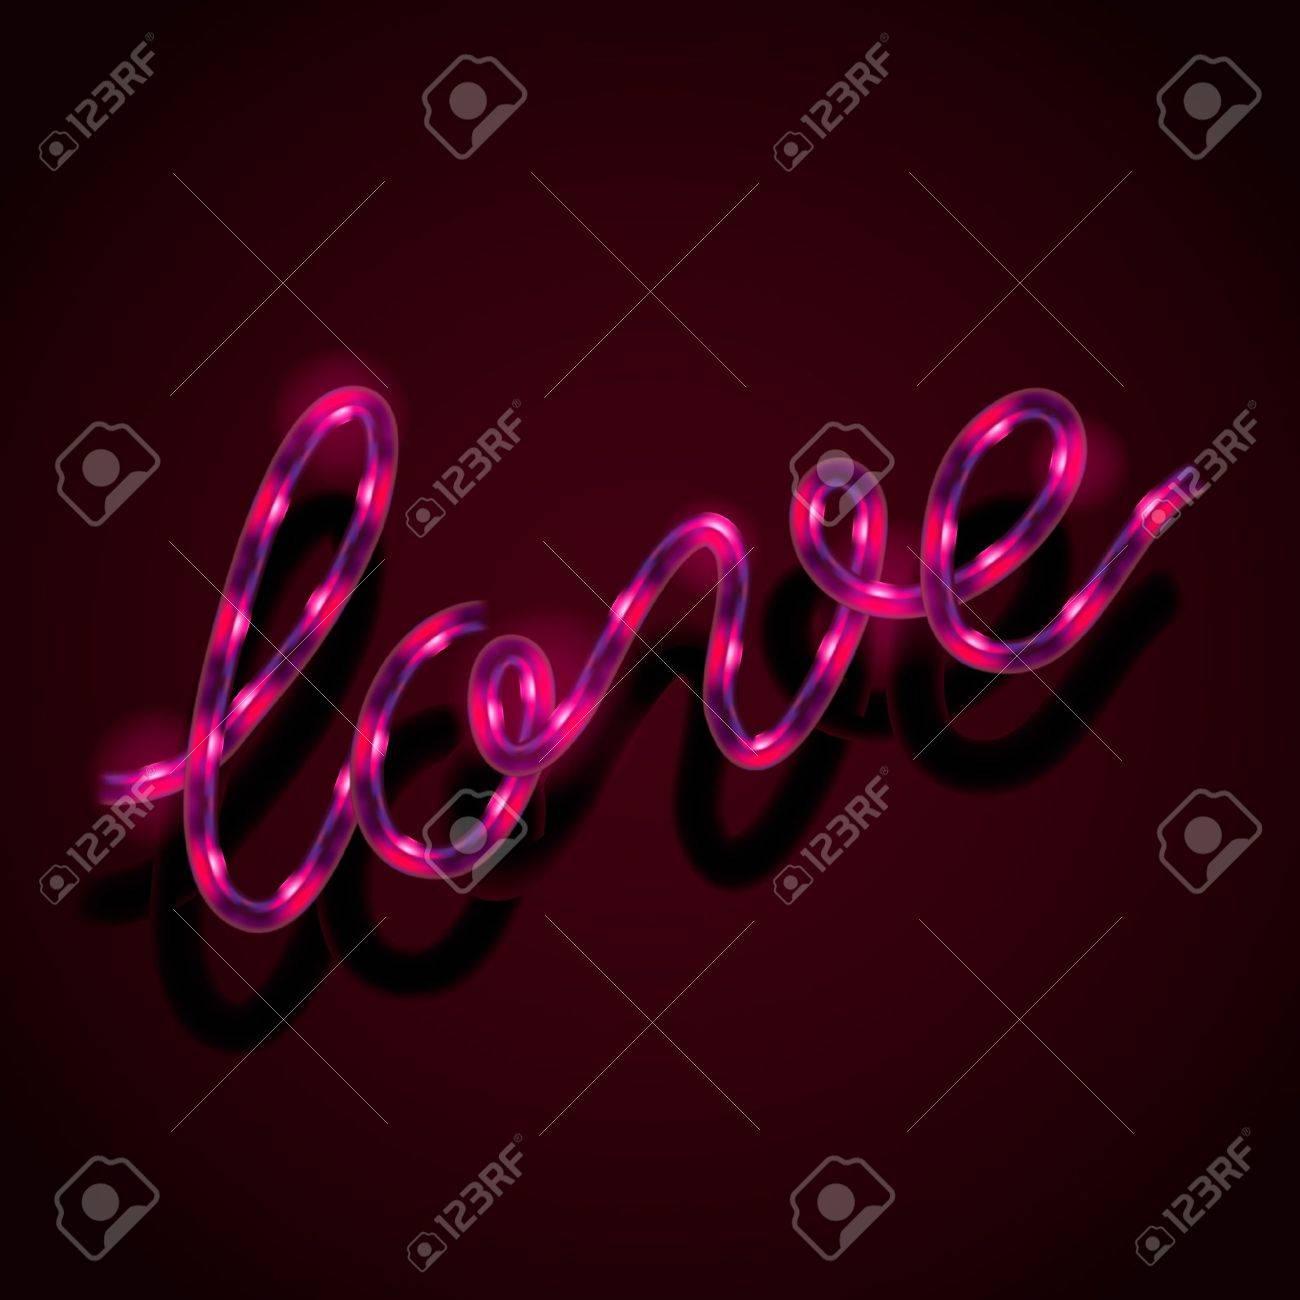 Glowing neon sign - Love Stock Vector - 18245277